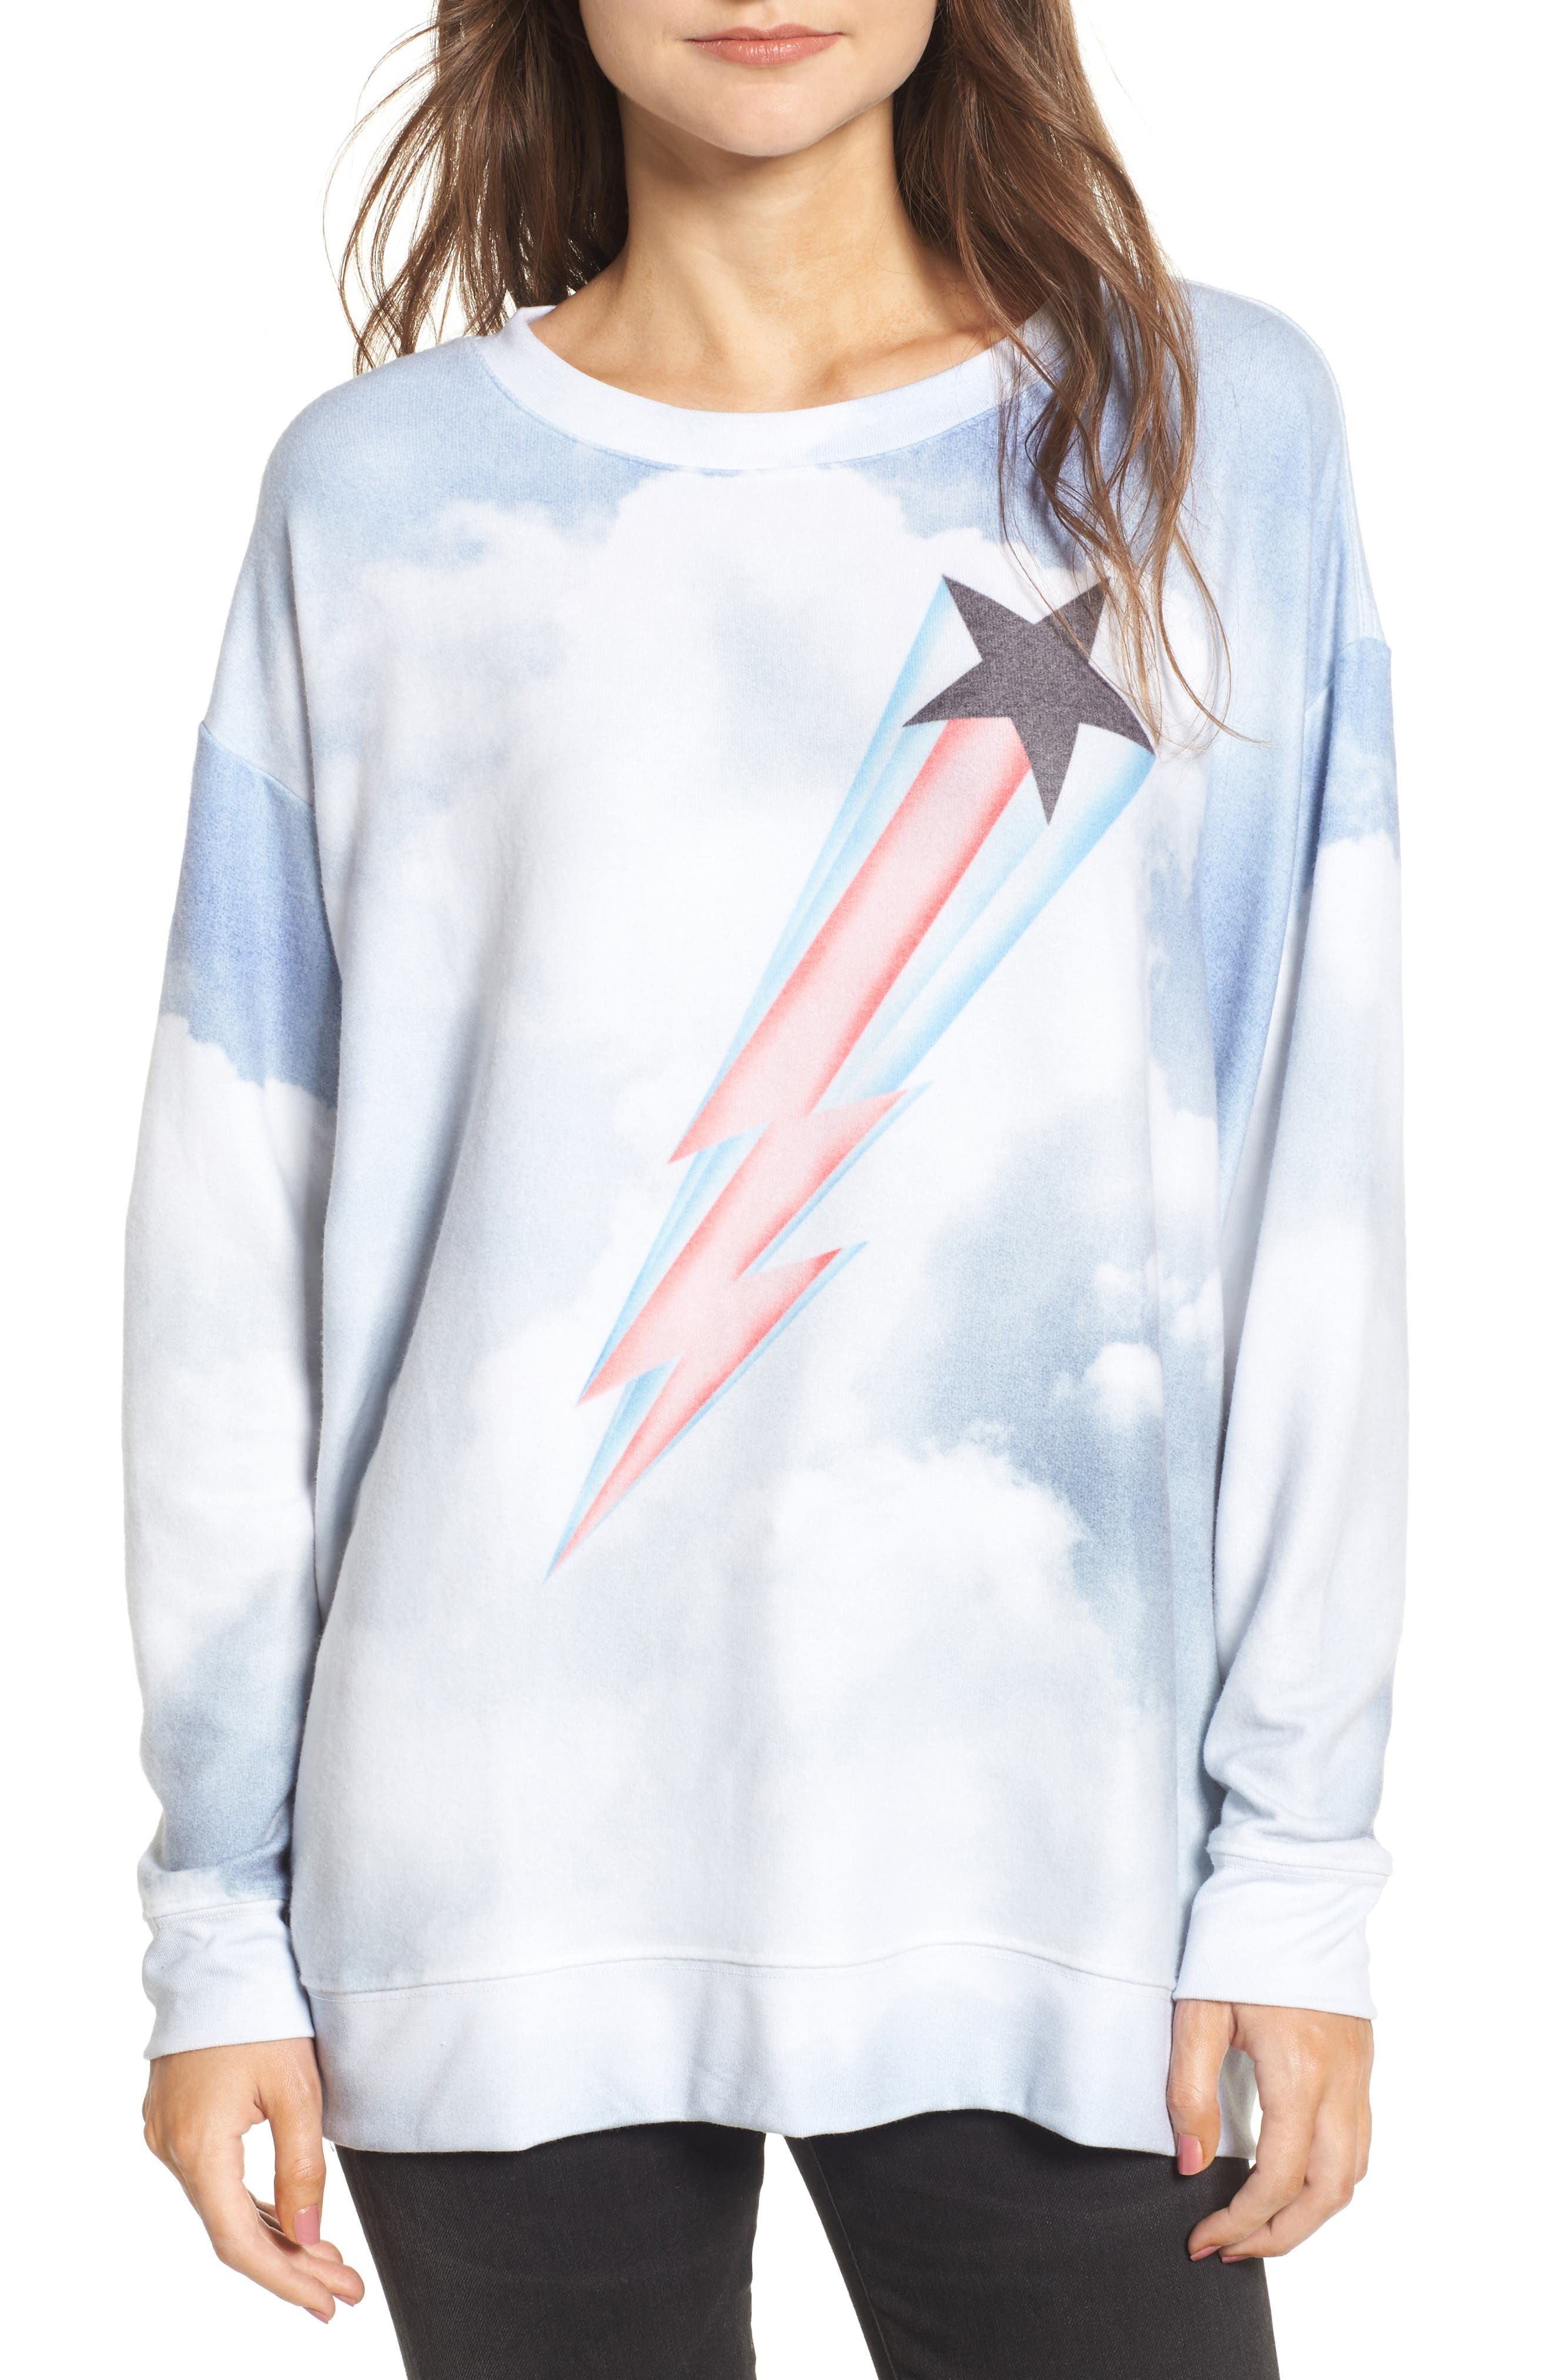 Wildfox Heavens Roadtrip Sweatshirt